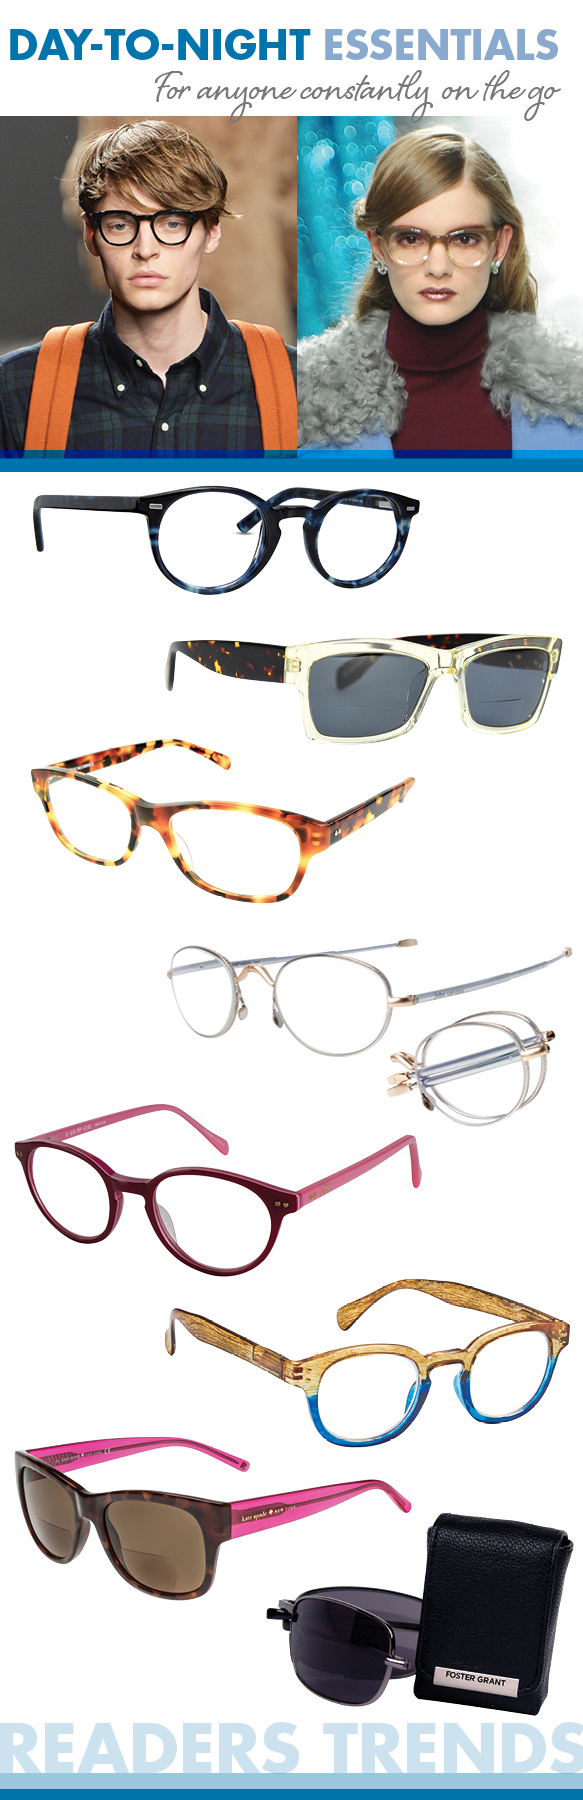 Cinzia Designs (Refocus), Ogi Eyewear (Morris), Corinne McCormack (Zooey), John Varvatos (V802), Lilly Pulitzer (Oasis), ICU Eyewear (7389), Kate Spade (Adanna), Foster Grant (Gulliver)